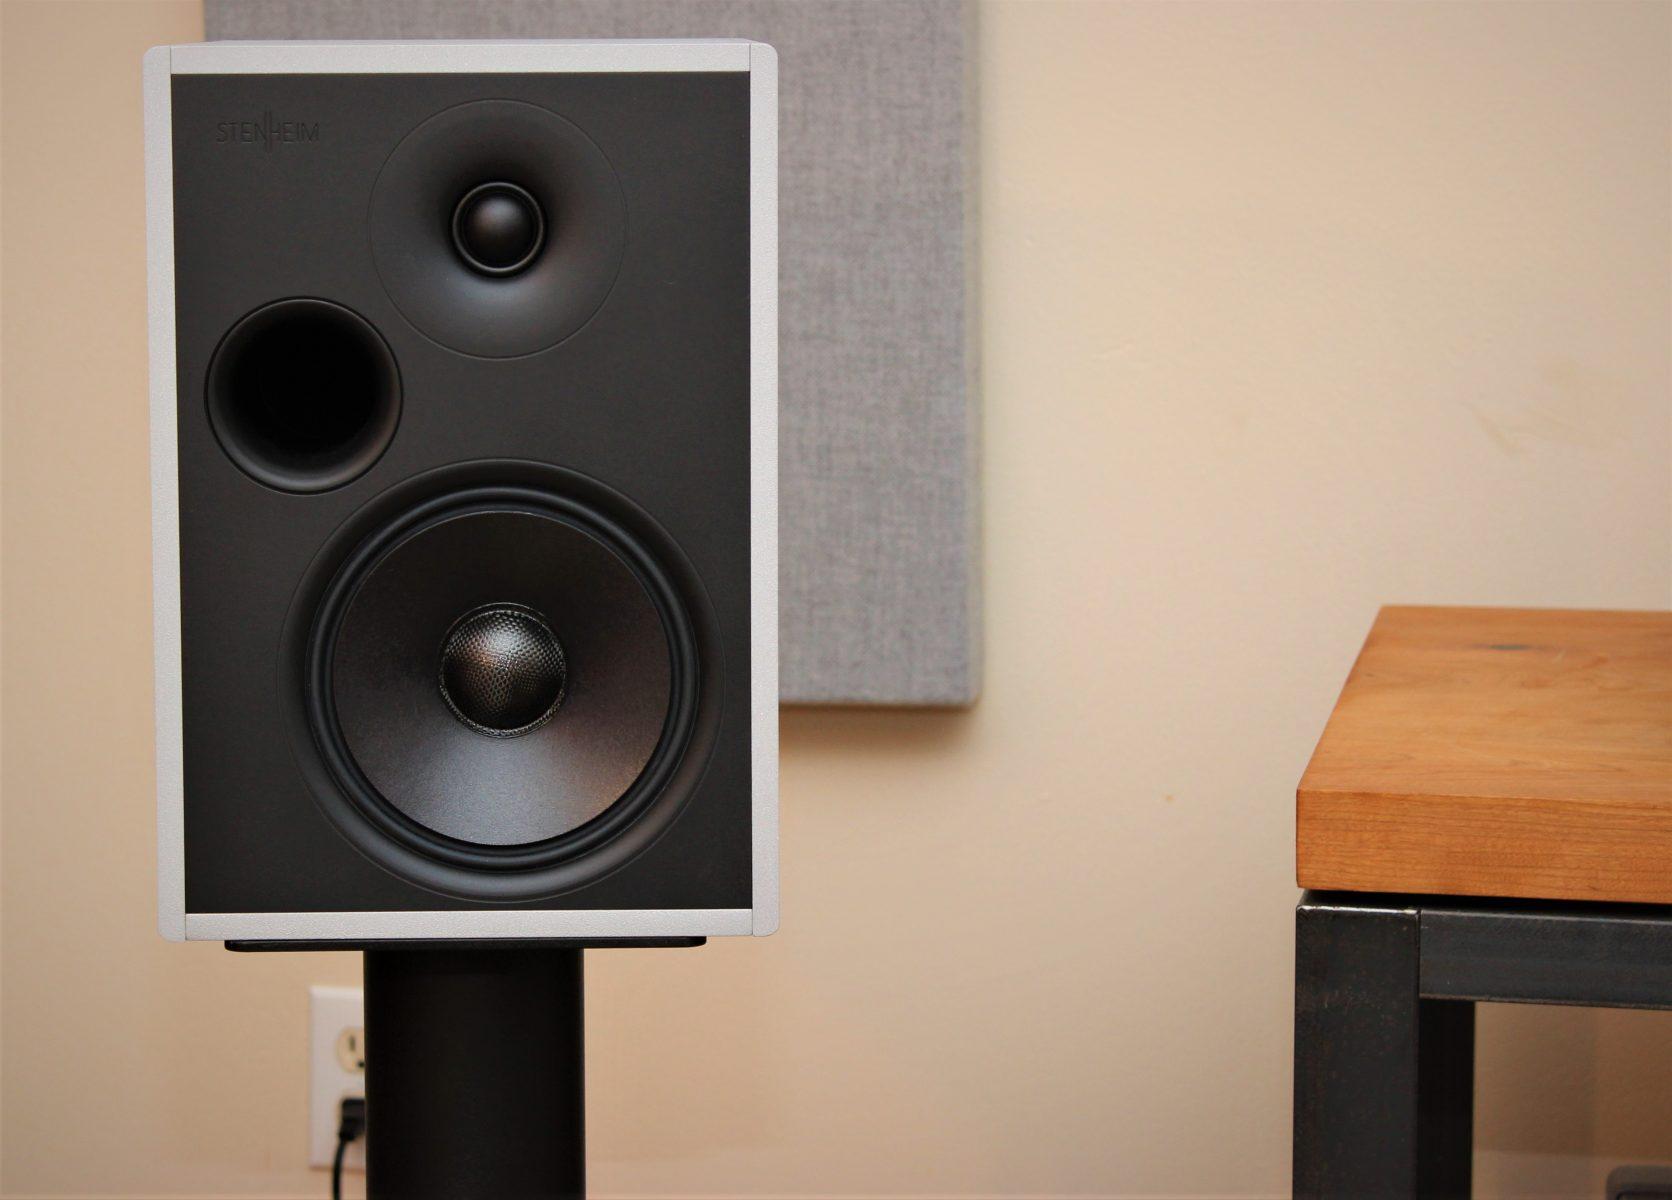 Stenheim Alumine 2 Loudspeakers | Review